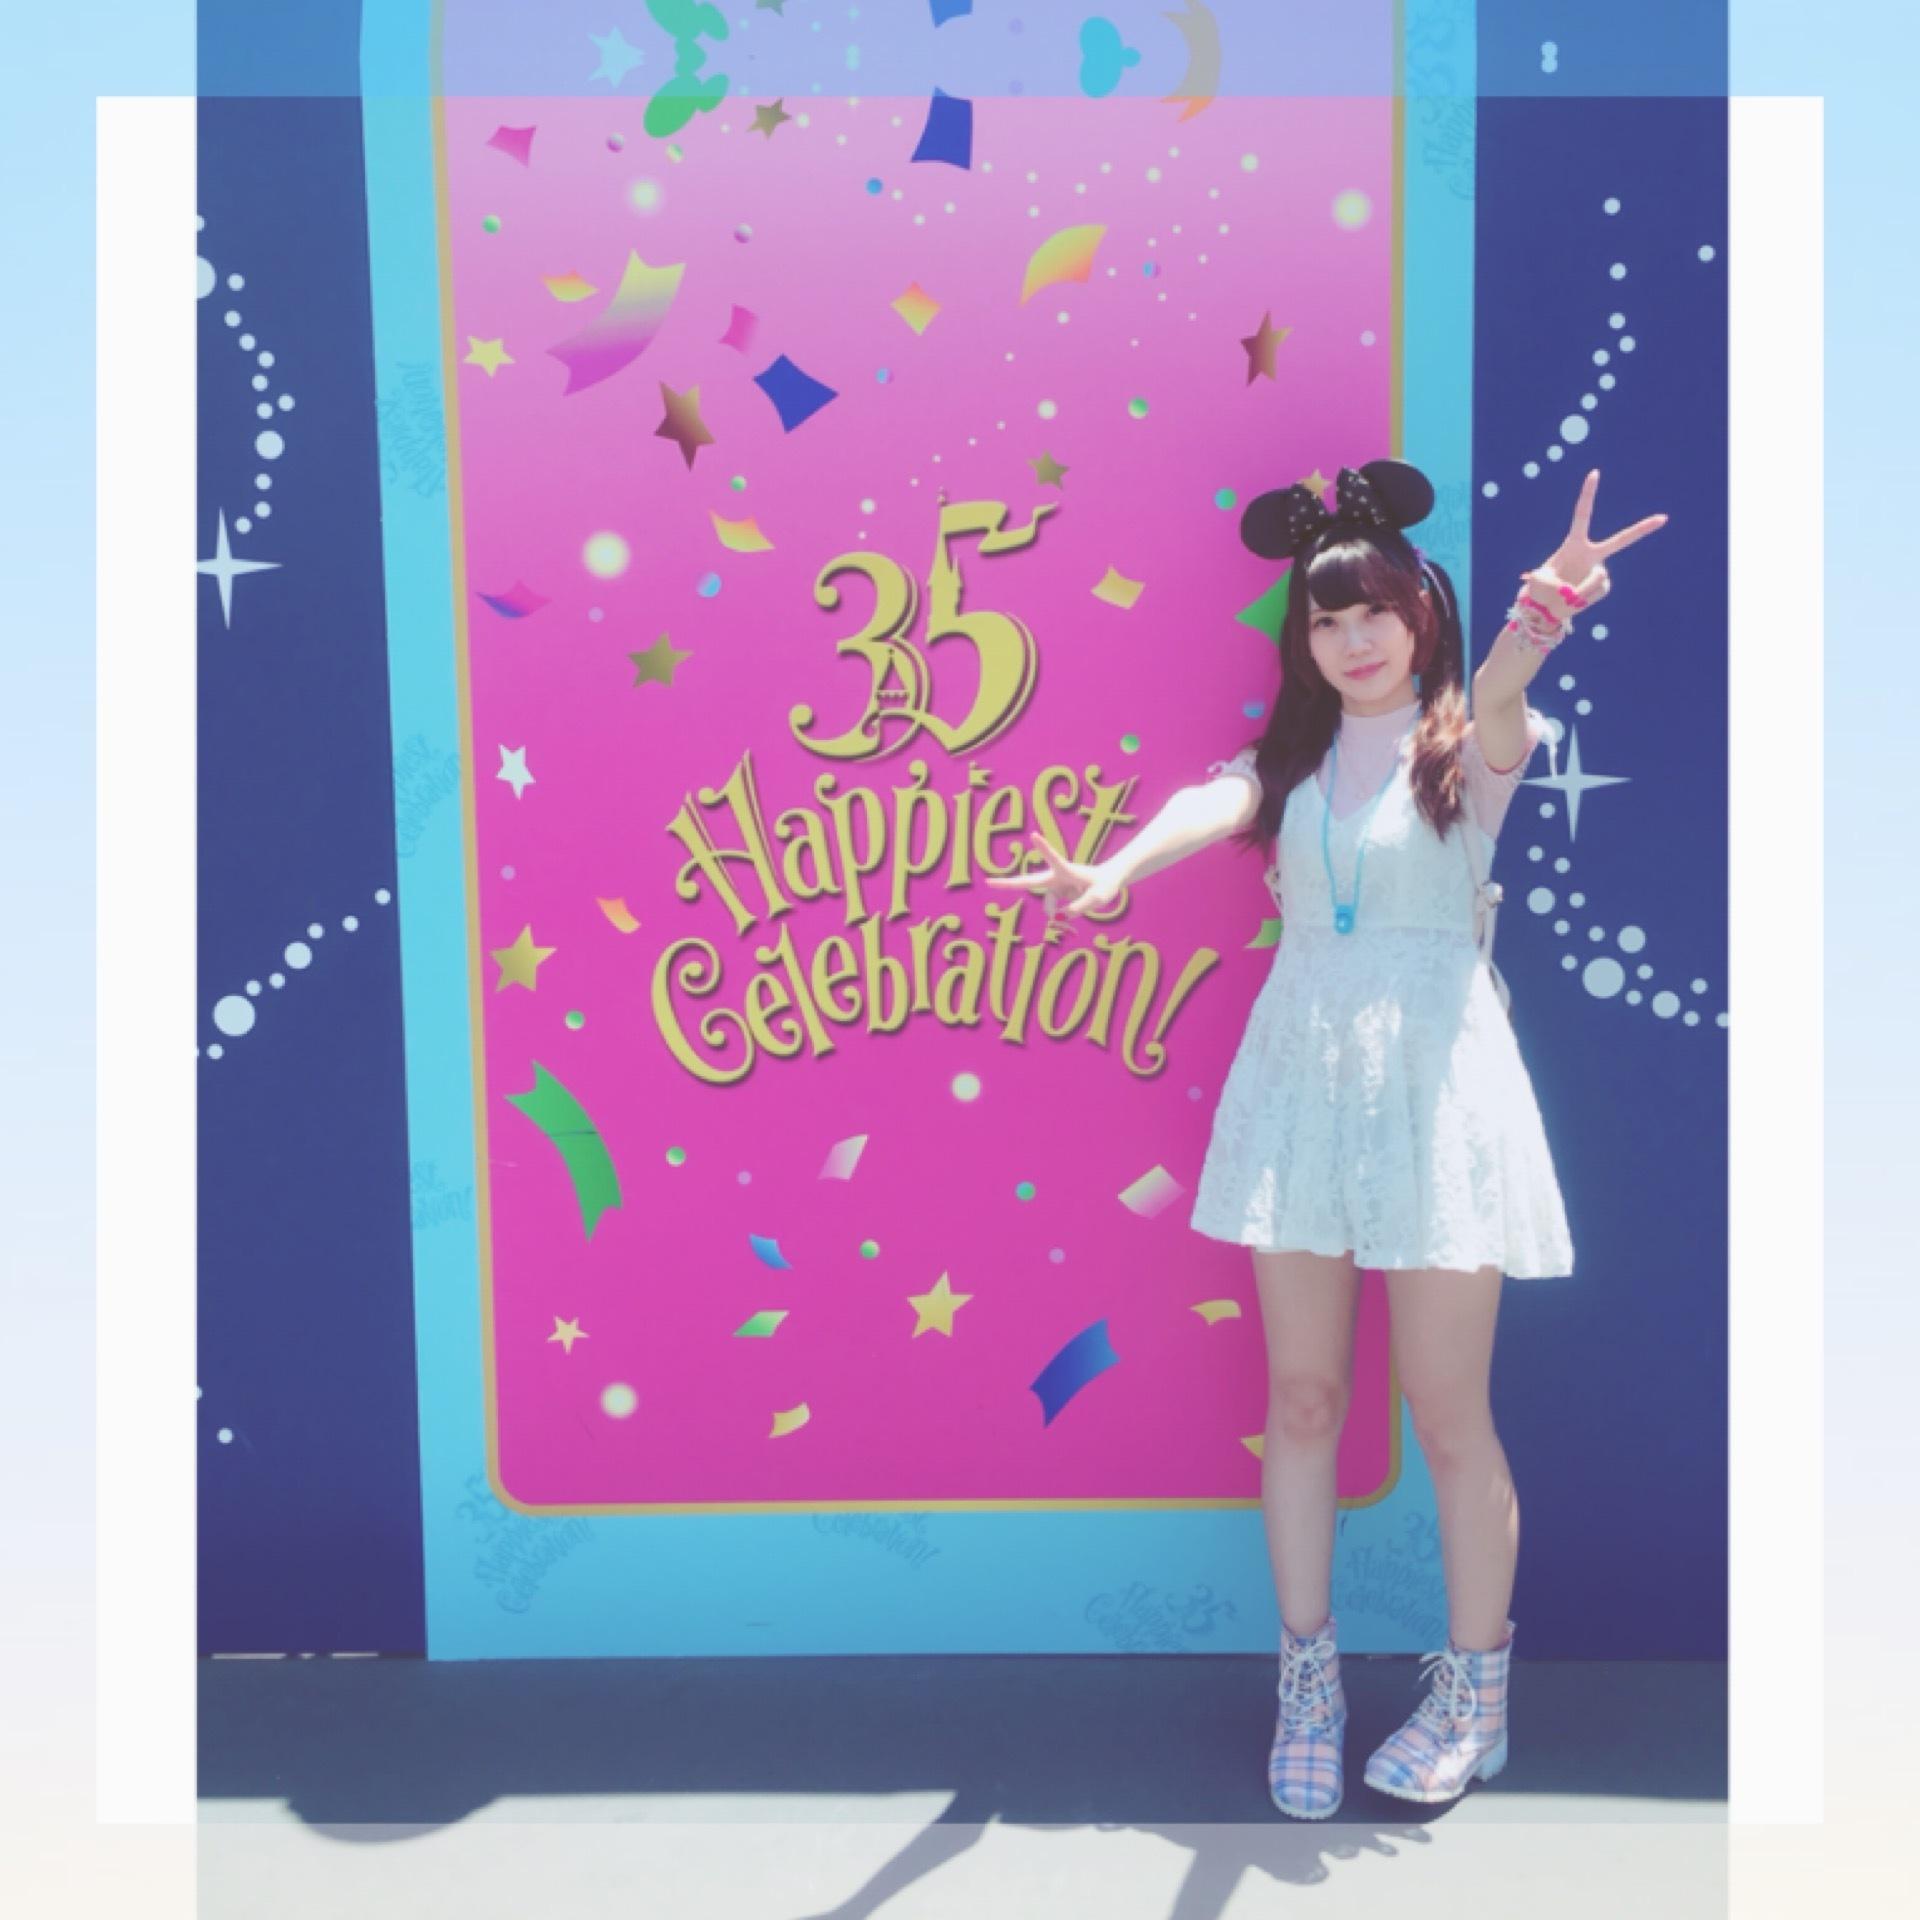 Tokyo Disneyland《 35 Happiest Gelebration! 》に行ってきました♫_1_5-1